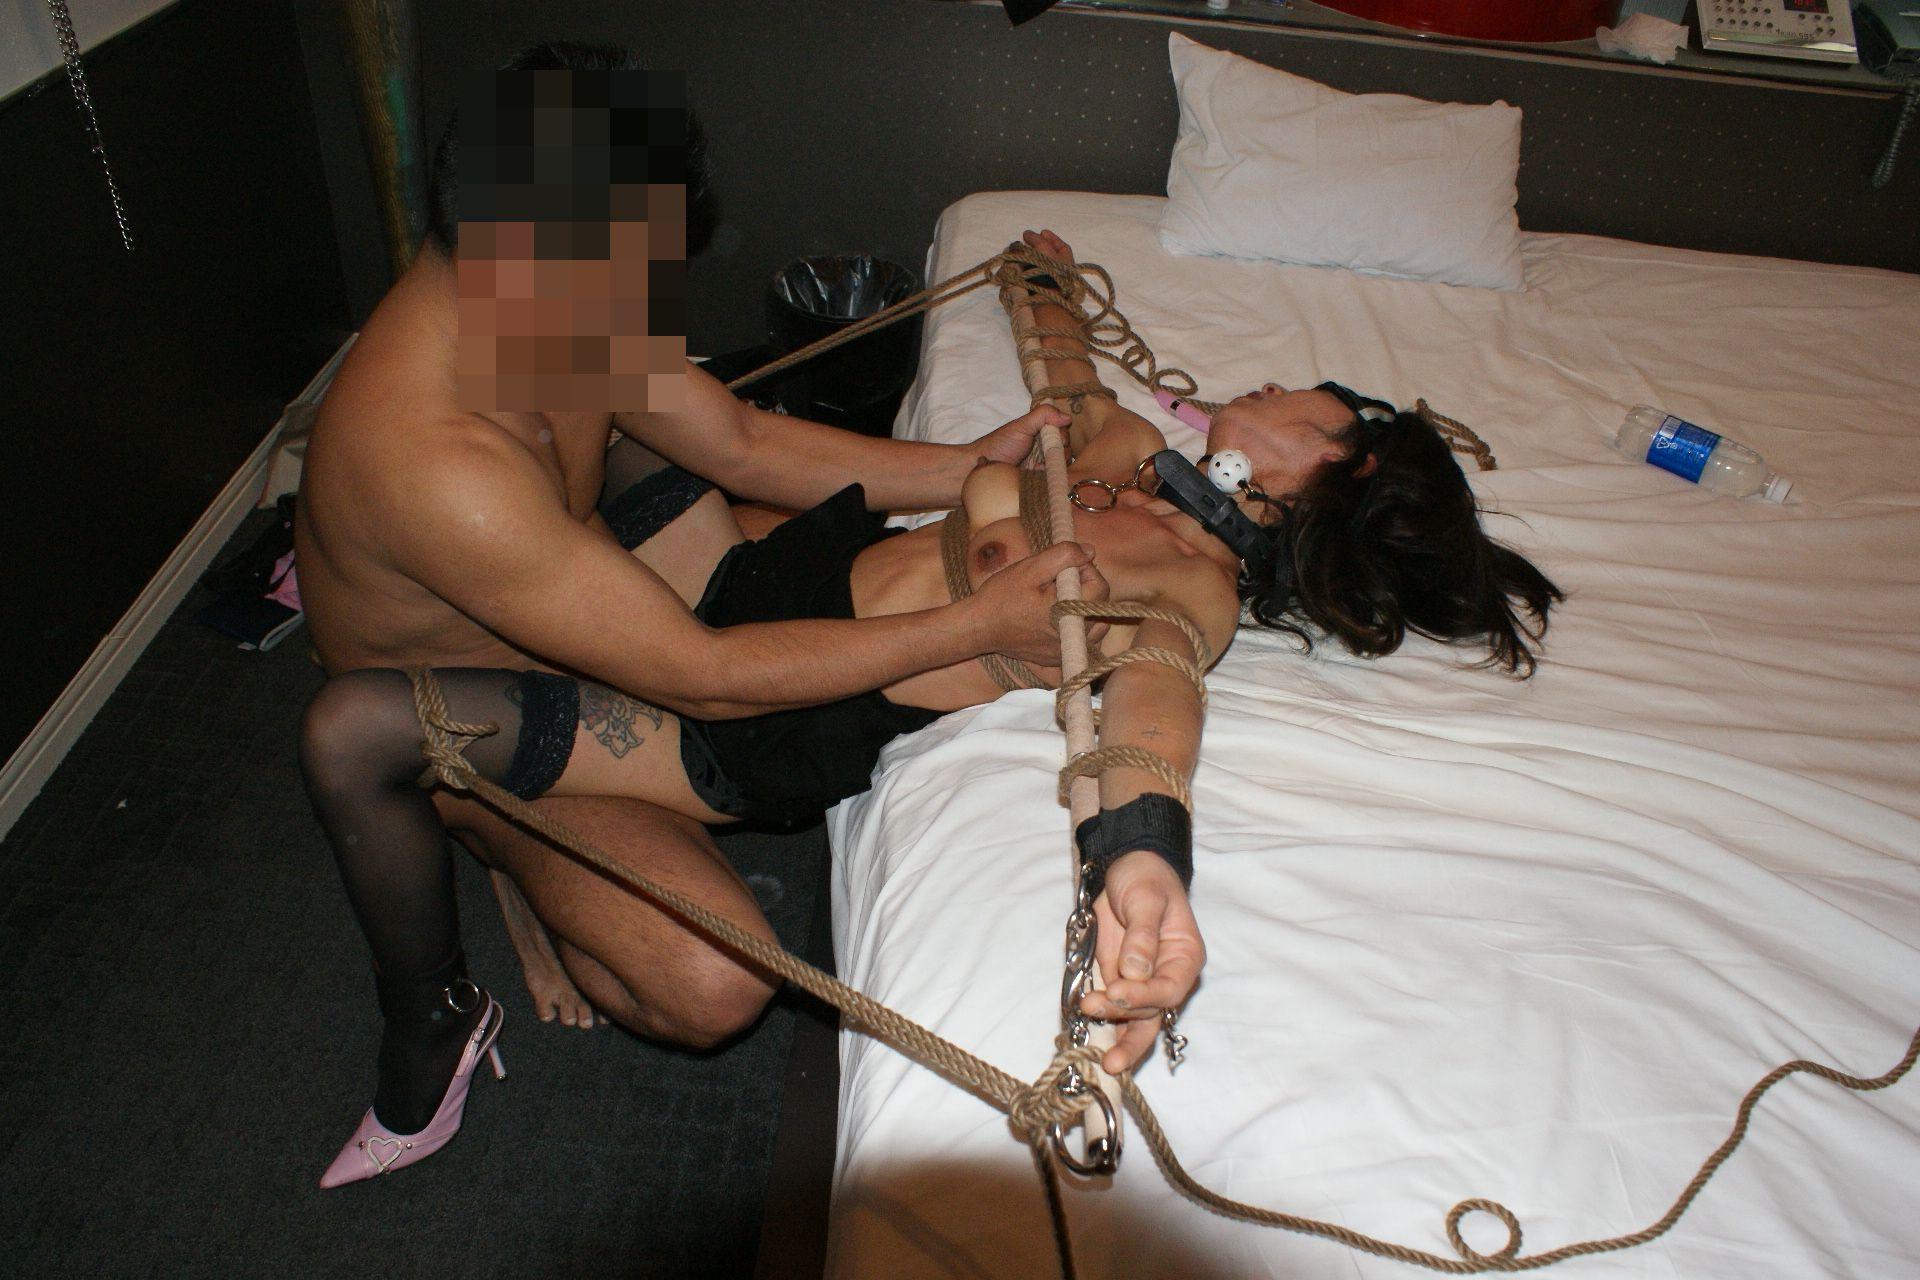 Bondage sex on the equus black label